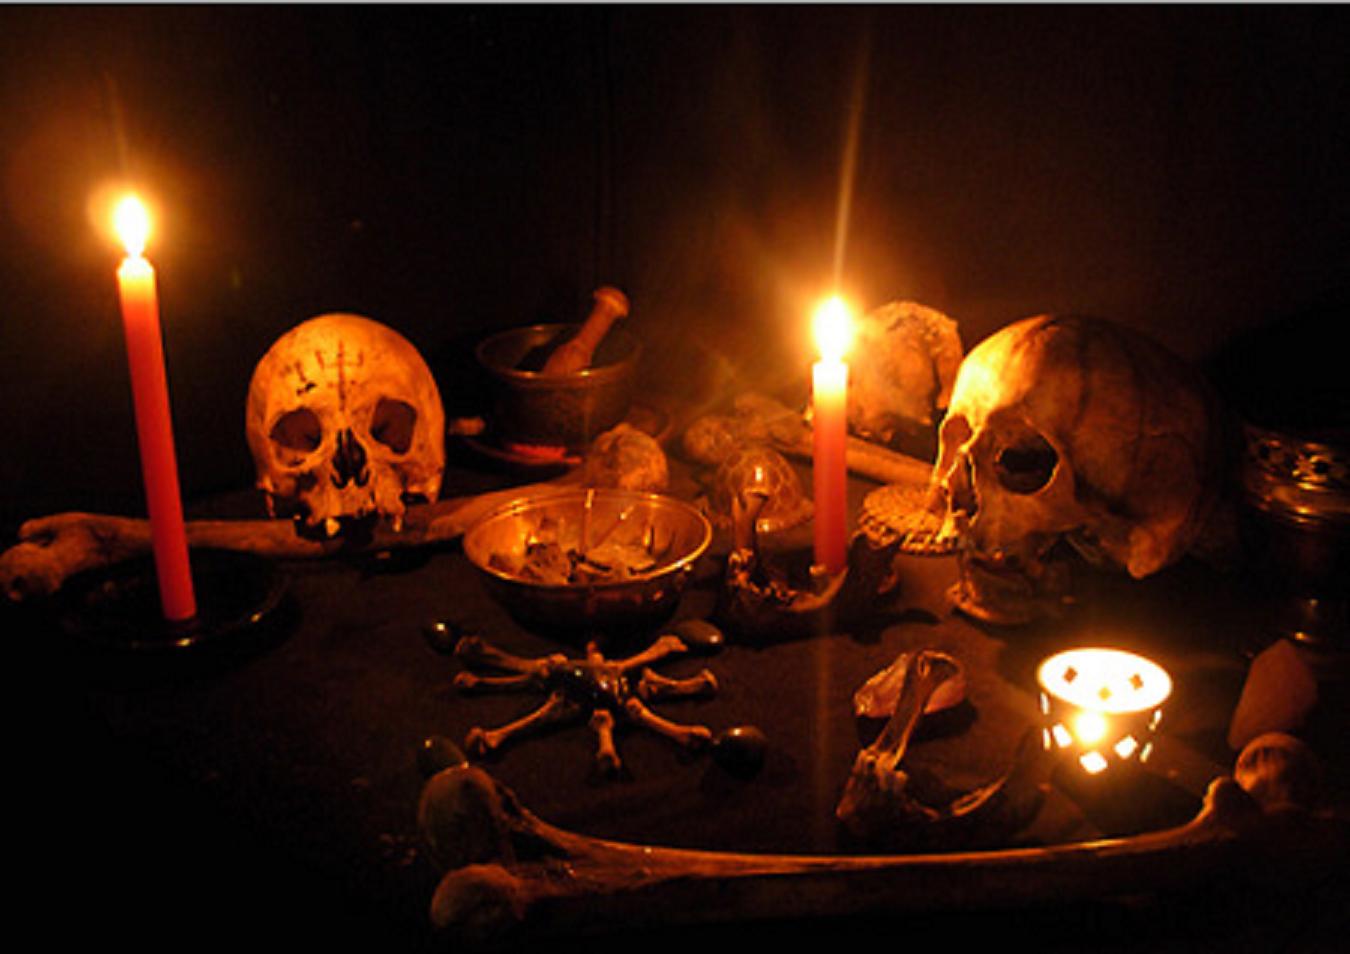 Palette / BlackMagicKalaJadu   Black magic spells, Black magic, Love spell  that work